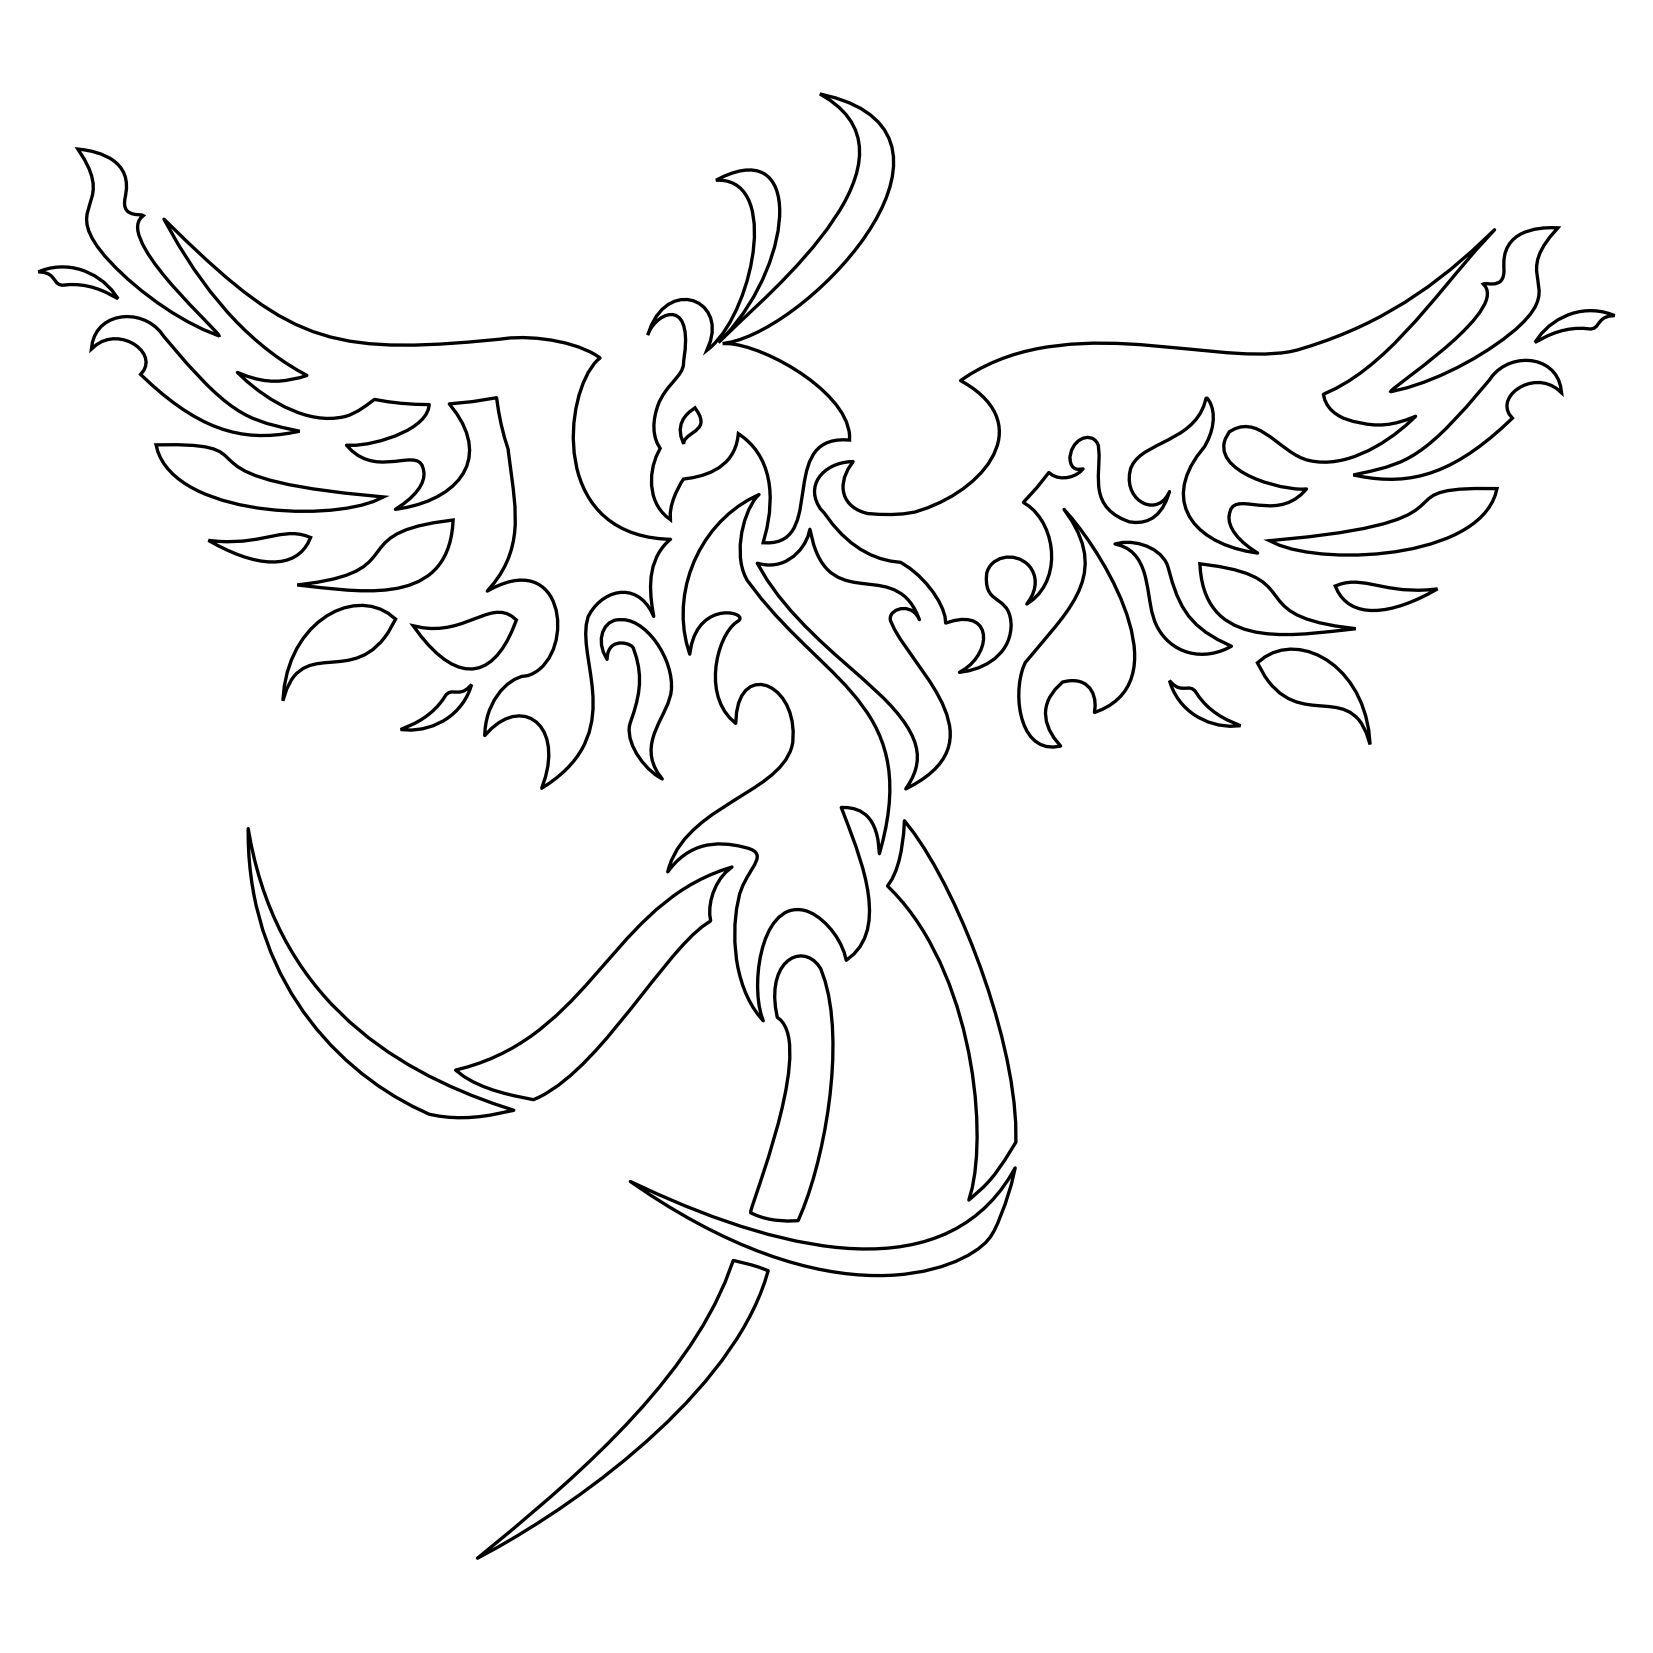 Tatuaggio Di Fenice Tribale,Eternità Tattoo